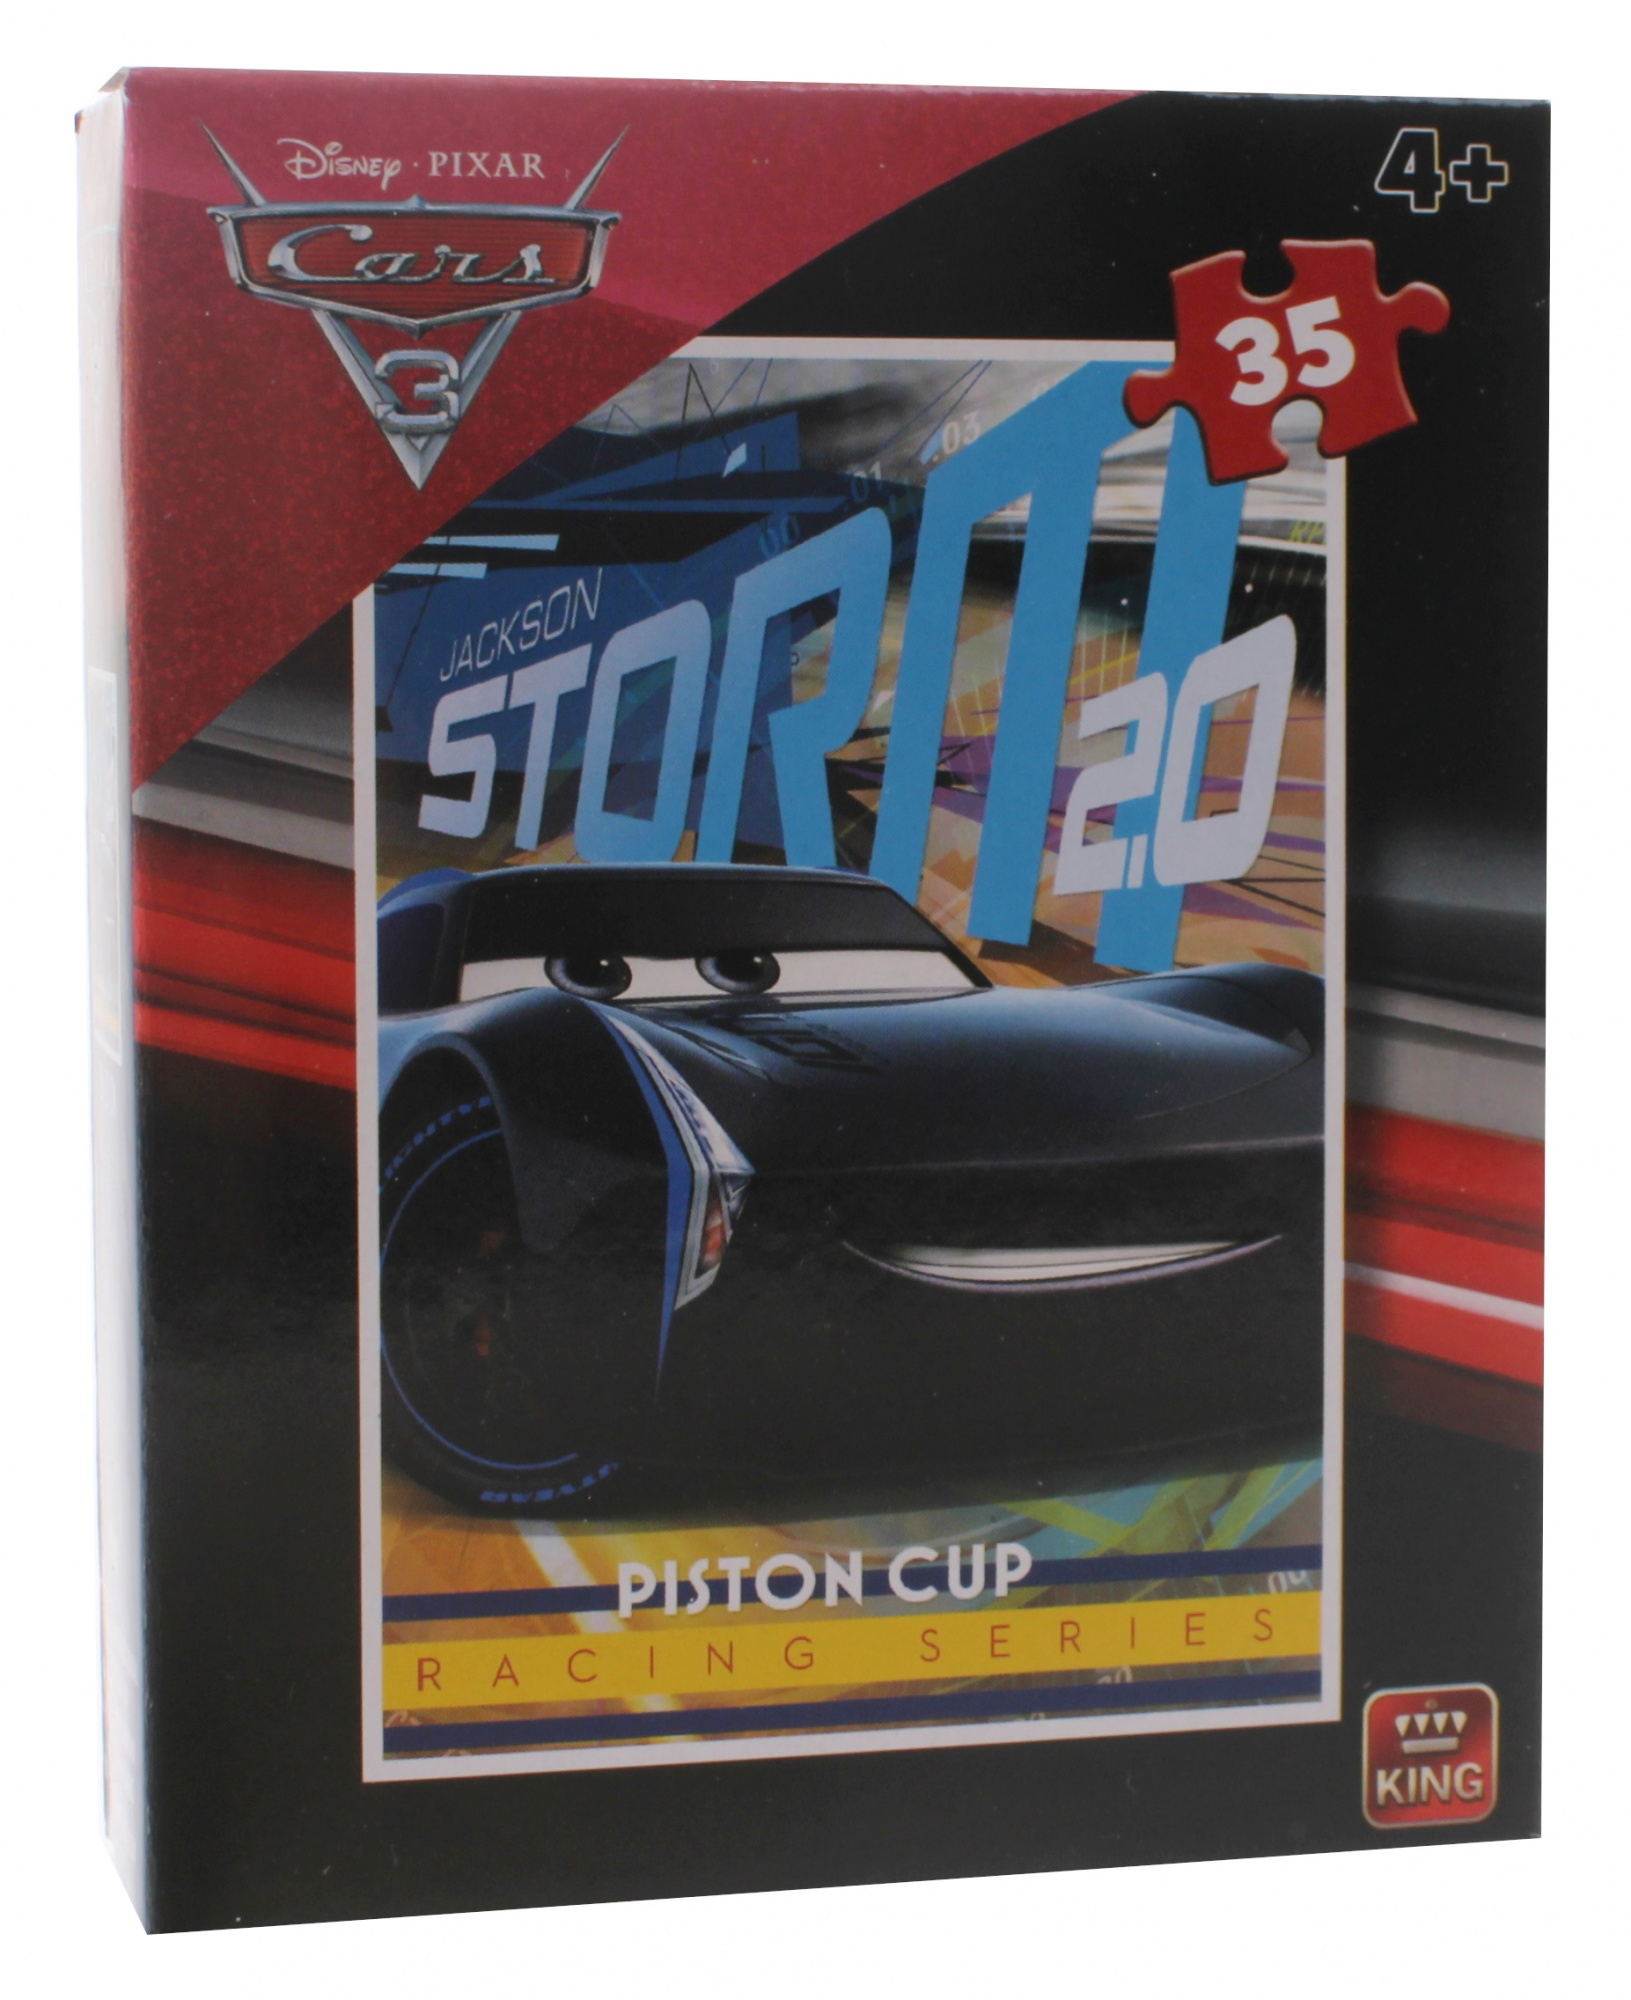 Jigsaw Puzzle Disney Cars 3 Jackson Storm 2 0 35 Pieces